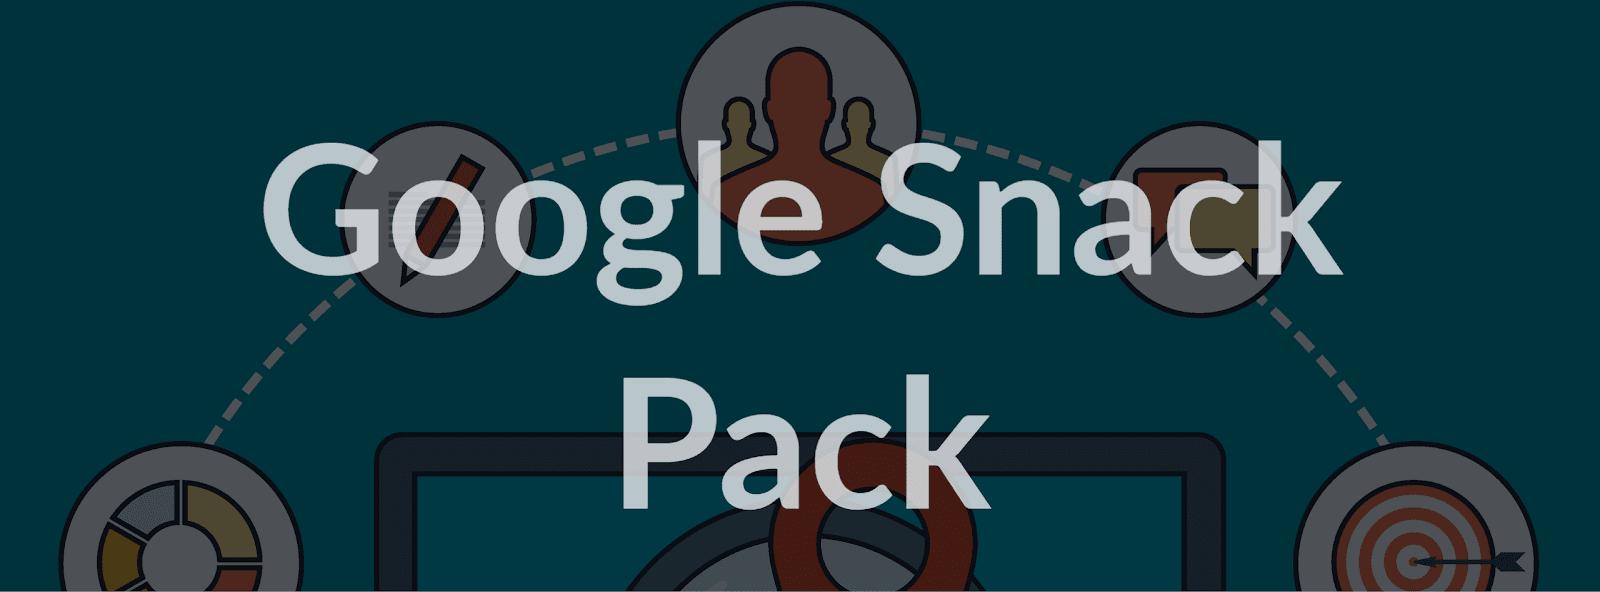 Google Snack Pack